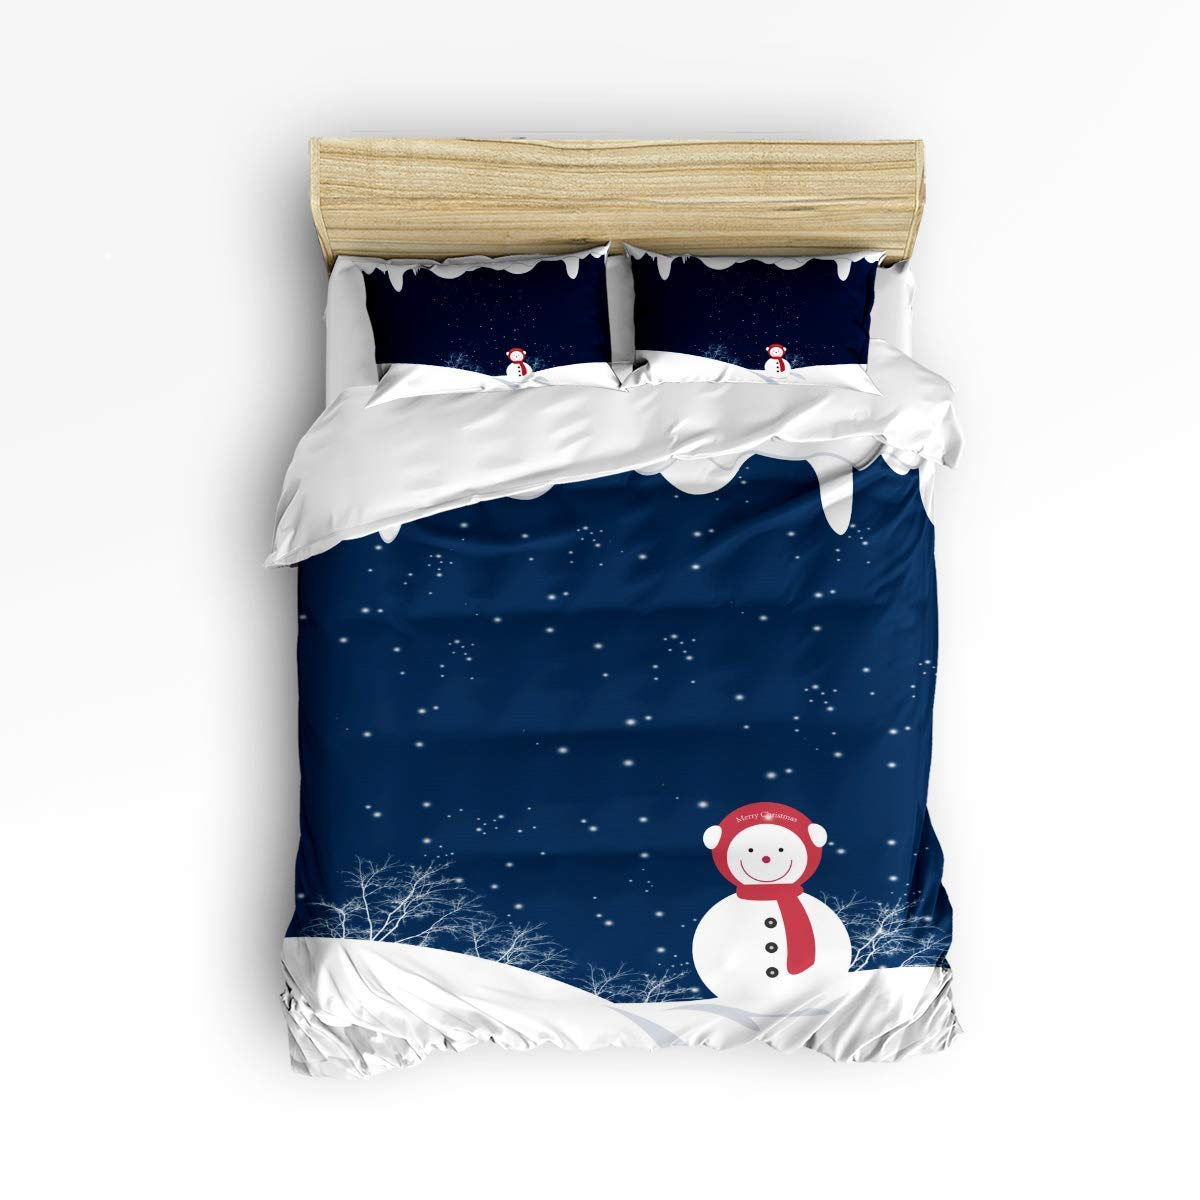 VAMIX 寝具3点セット クリスマス 雪だるま 庭 楽しい雪 星空 夜 3ピース 掛け布団カバーセット ベッドスプレッド デイベッド 子供/子供/ティーン/大人 King Size zly3pcsbeds-181022-SWTQ00372SJSDAZN B07QHV772K Snowman1azn2590 King Size